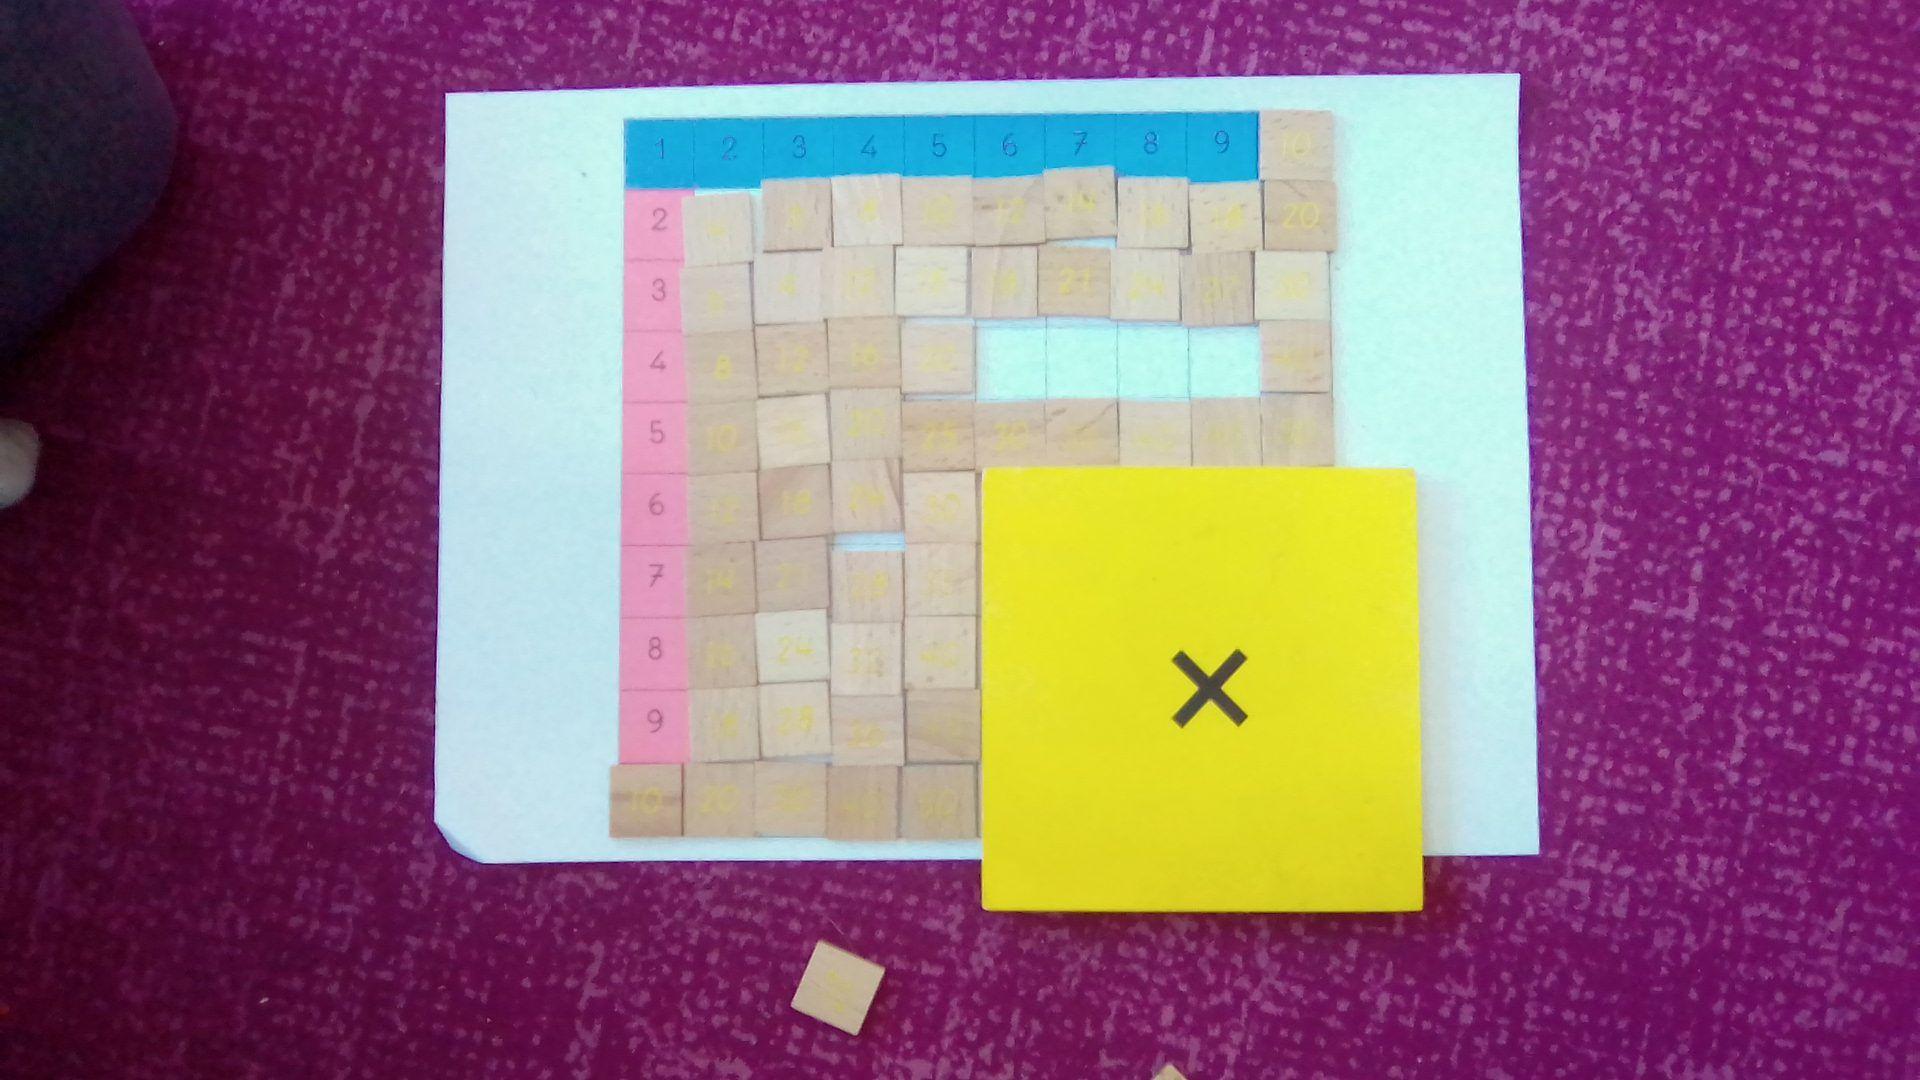 Apprendre les tables de multiplication façon Montessori